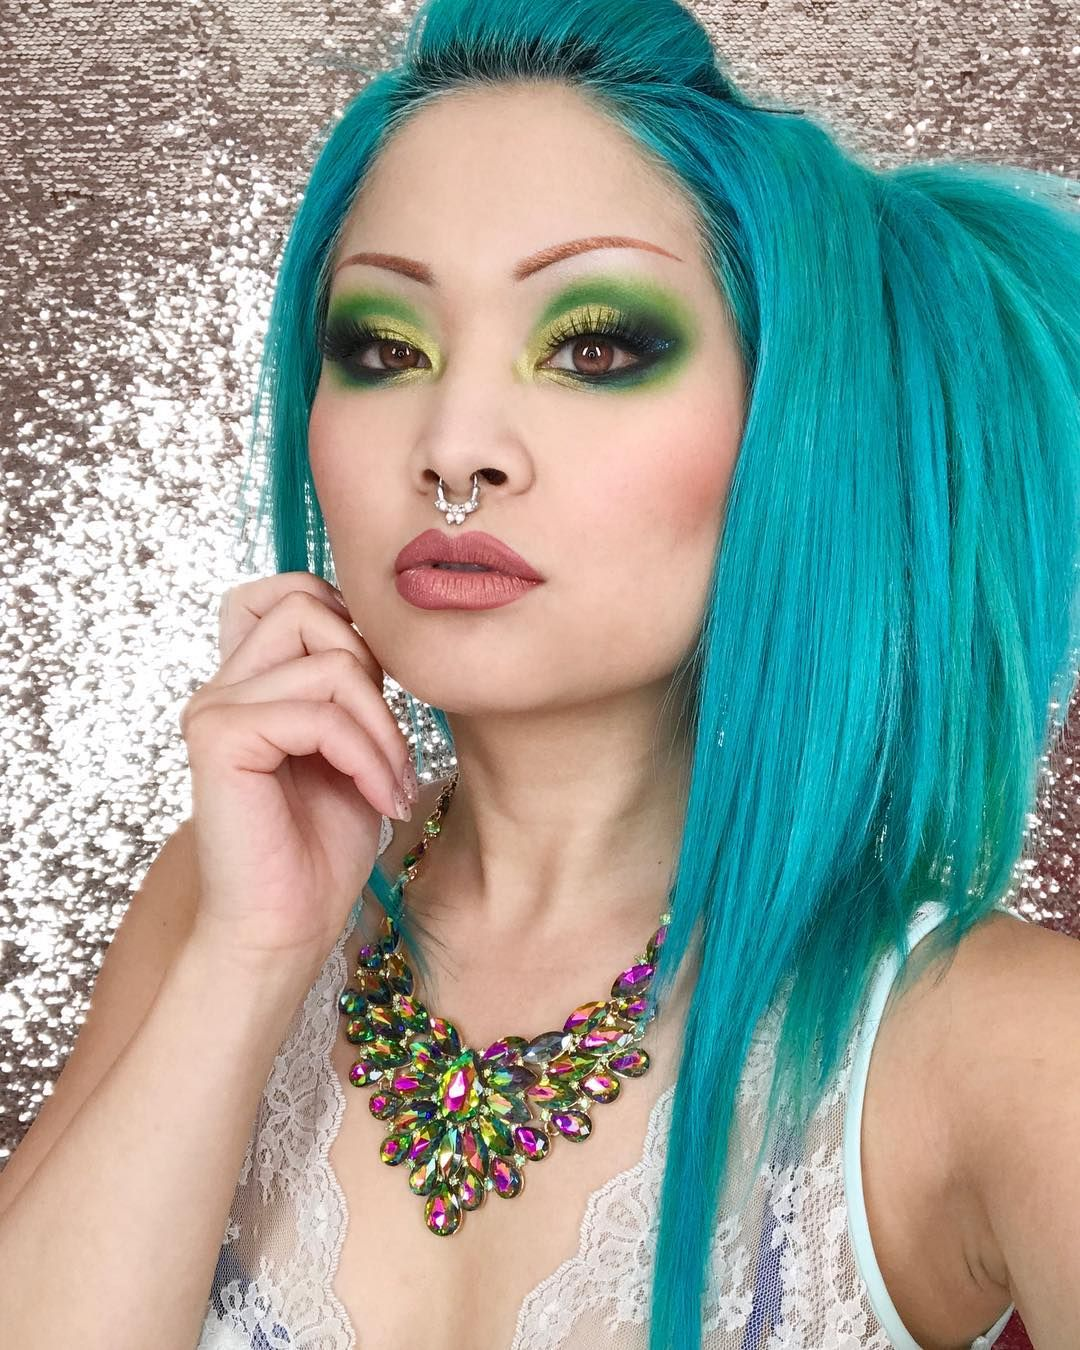 shrinkle wears #sugarpill Money Maker, Midori, Acidberry